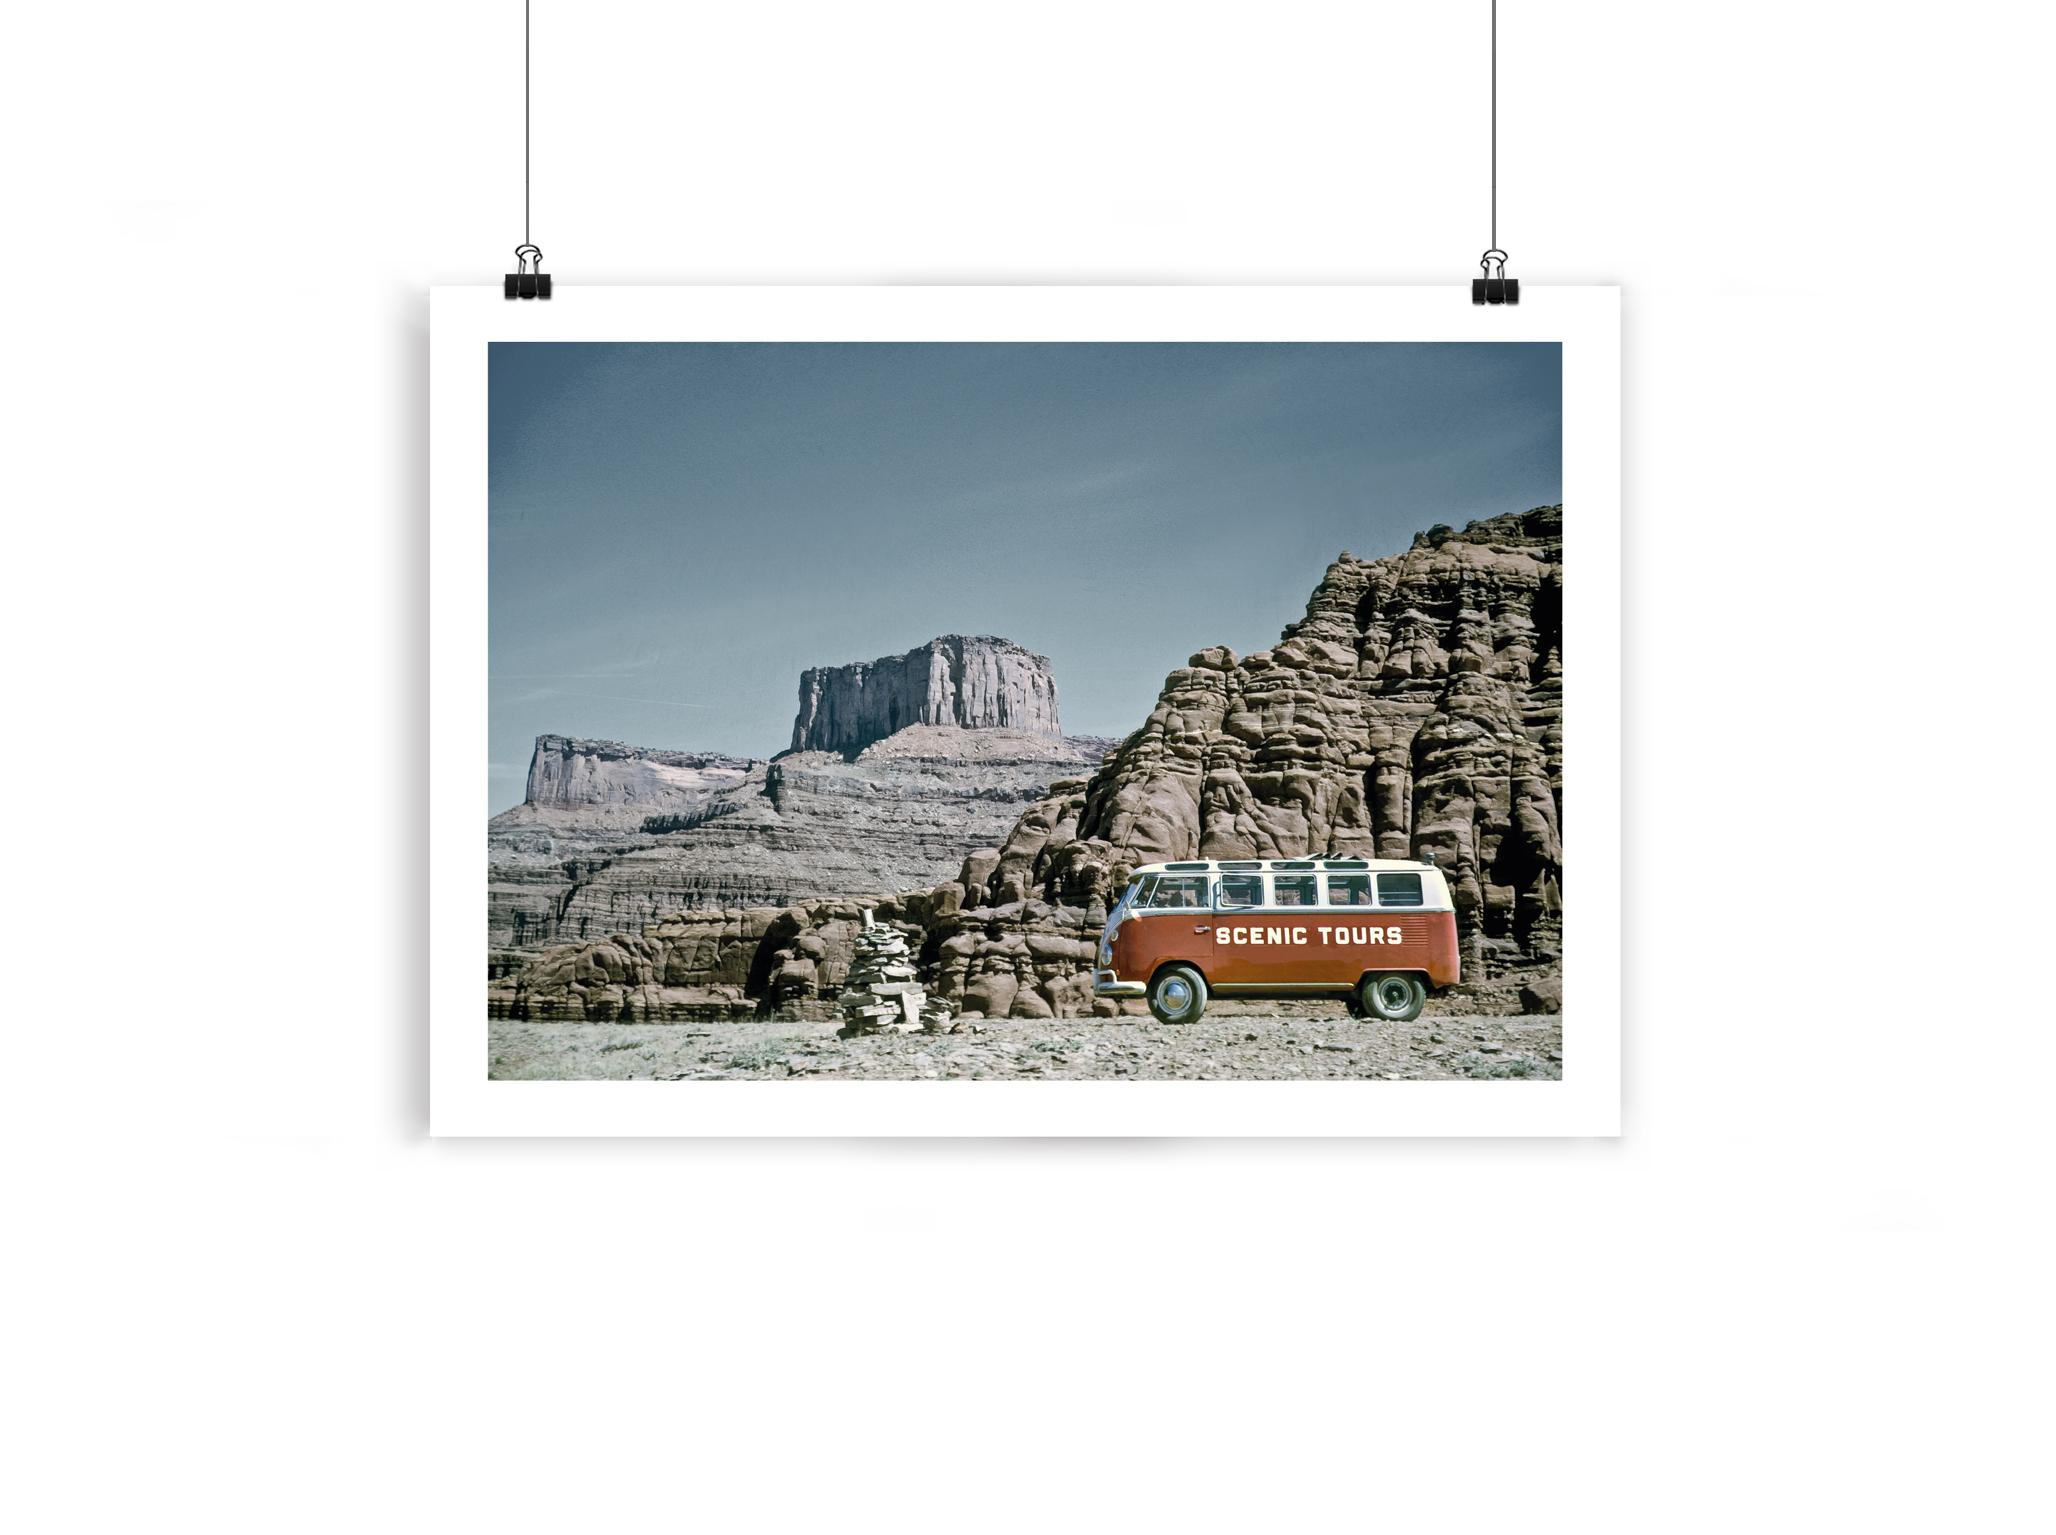 Scenic tours 70x50.jpg